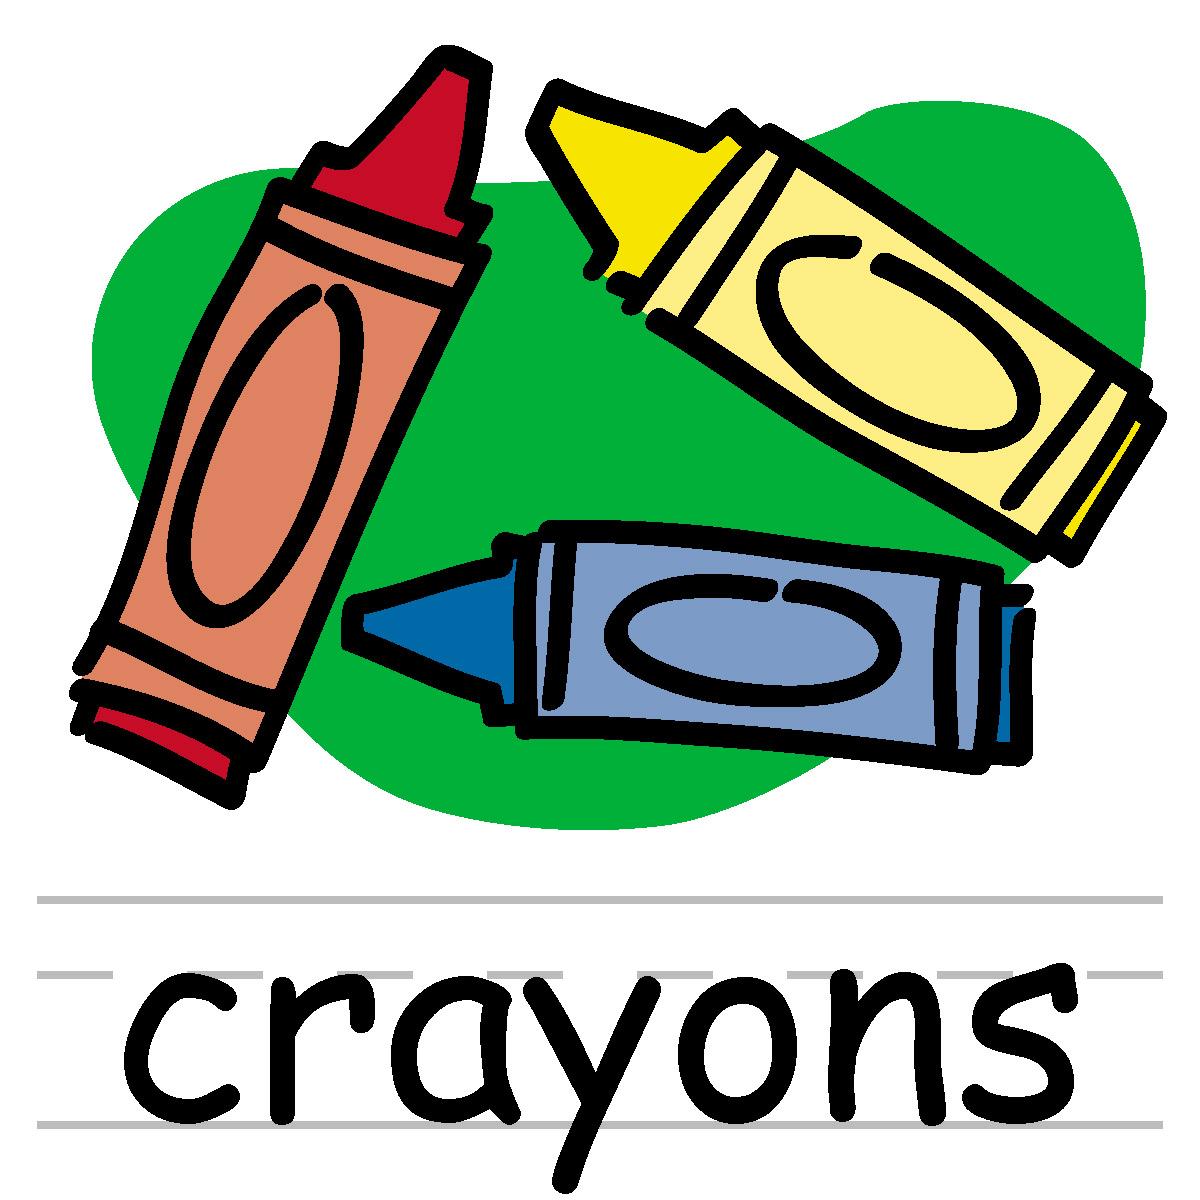 clipart coloring book at getdrawings com free for personal use rh getdrawings com coloring clip art pictures coloring clip art for kids